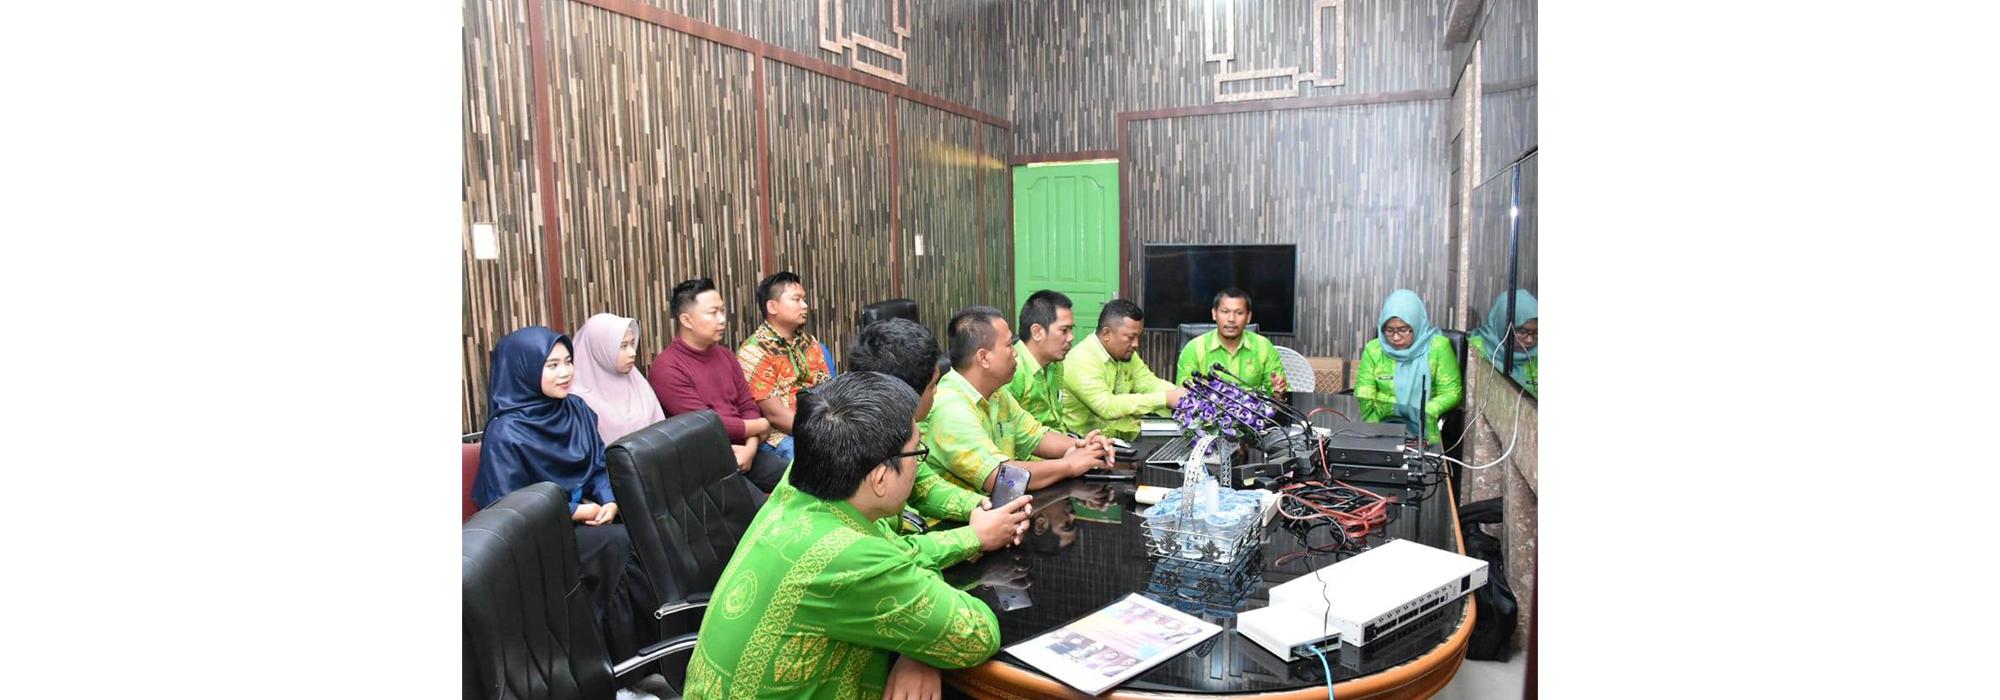 Dinas Kominfo Sergai, Kelola Media Center Secara Profesional